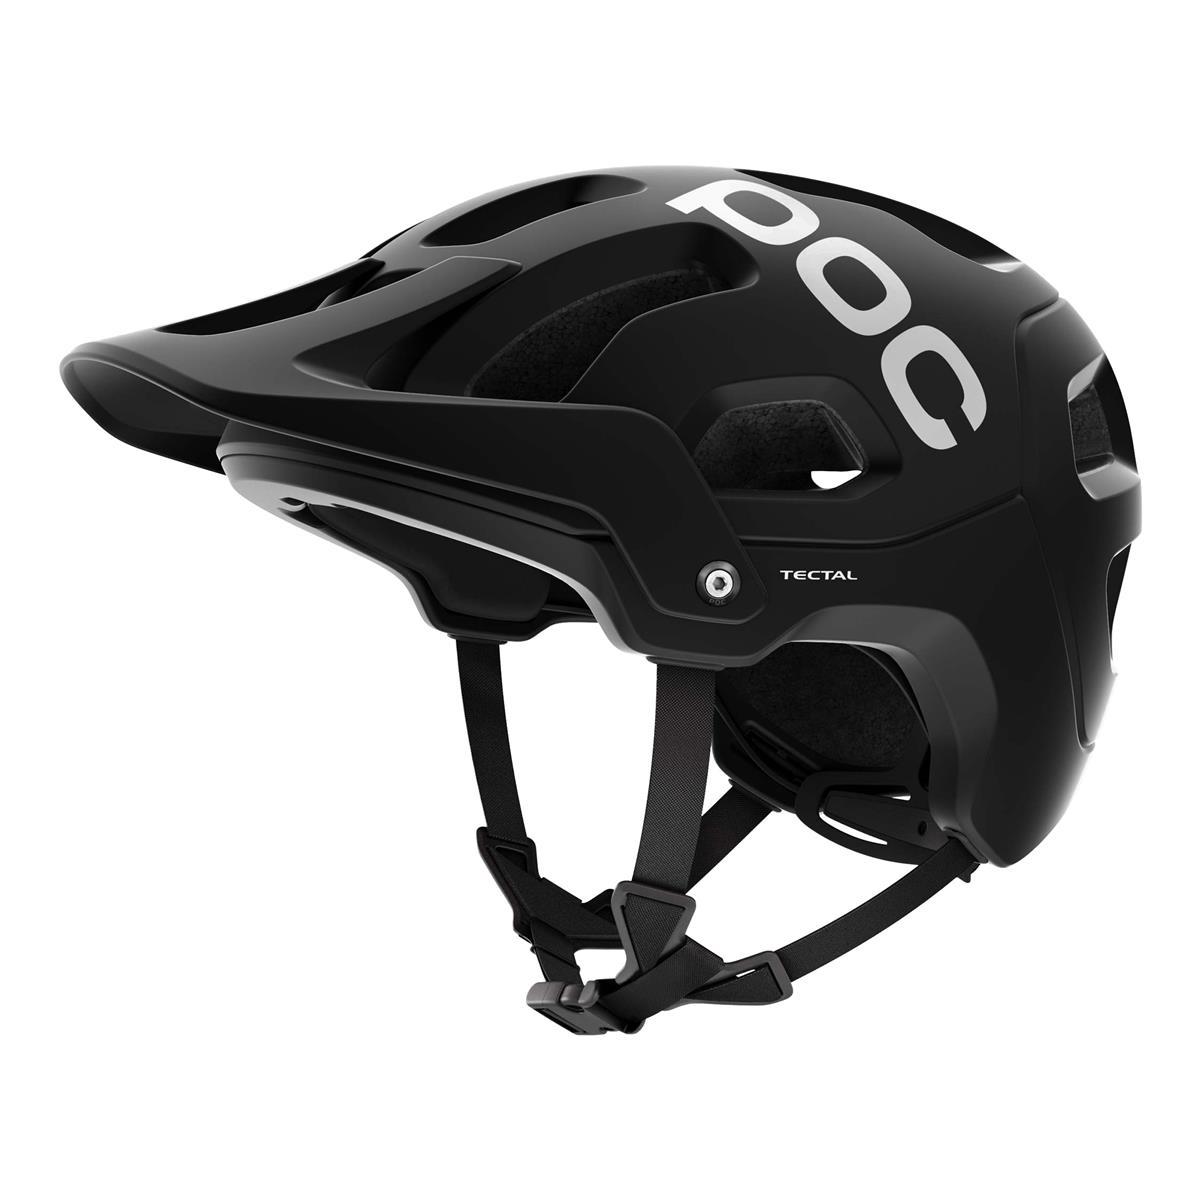 Enduro helmet Tectal black size XS-S (51-54cm)